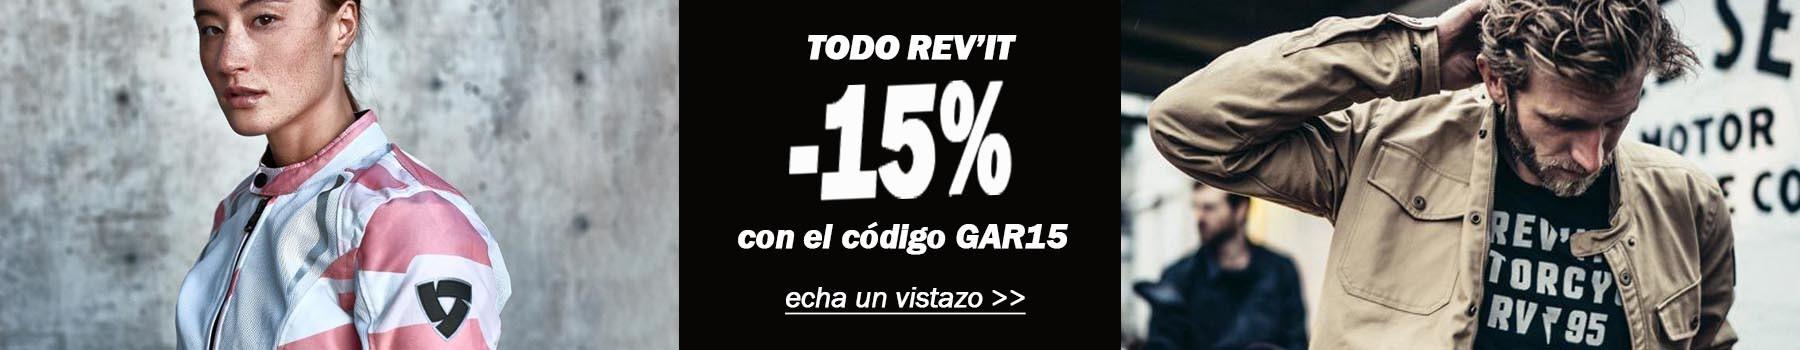 revit 15%